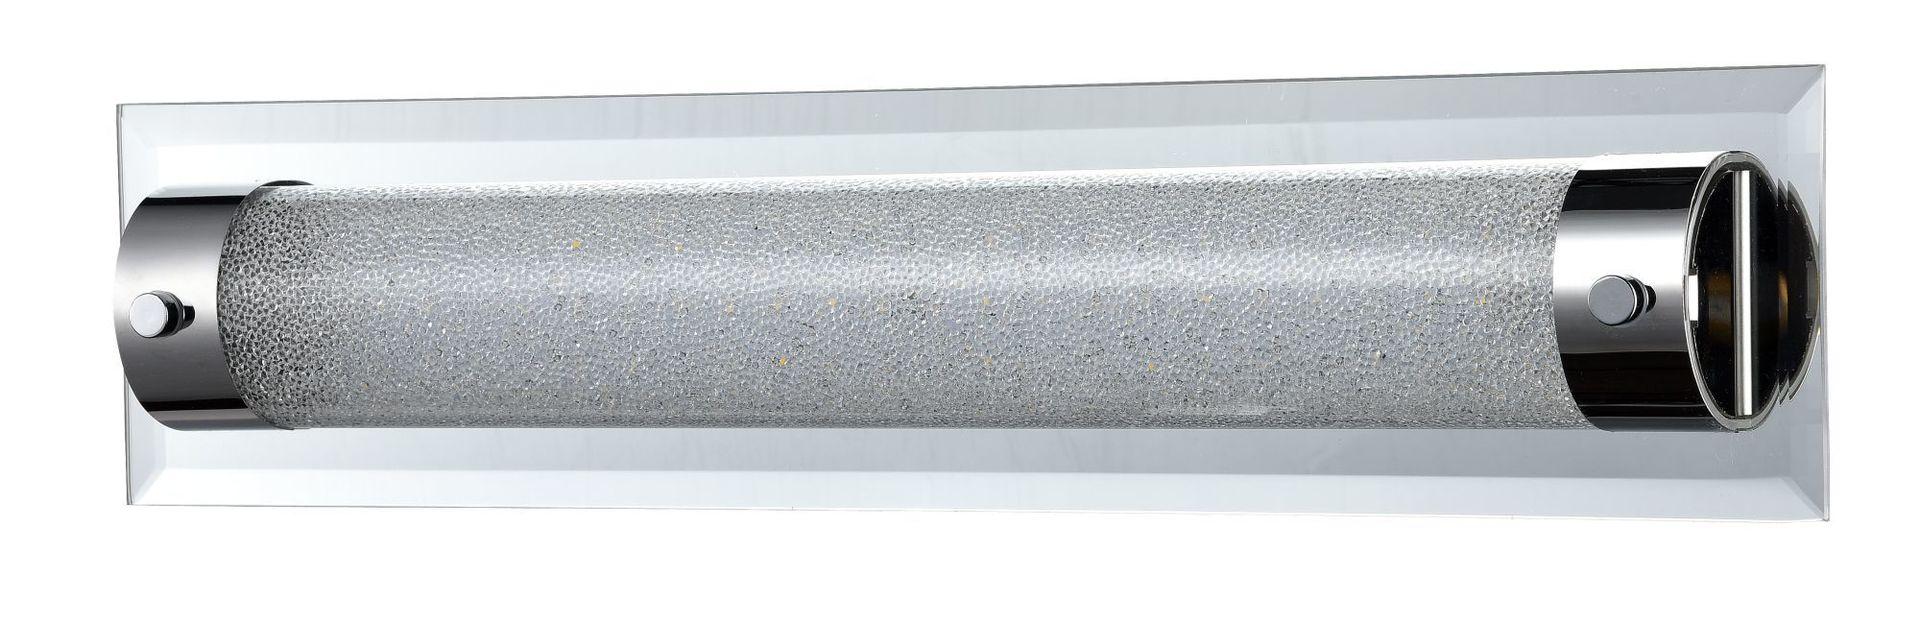 Plafond Maytoni Plasma C444-WL-01-13W-N